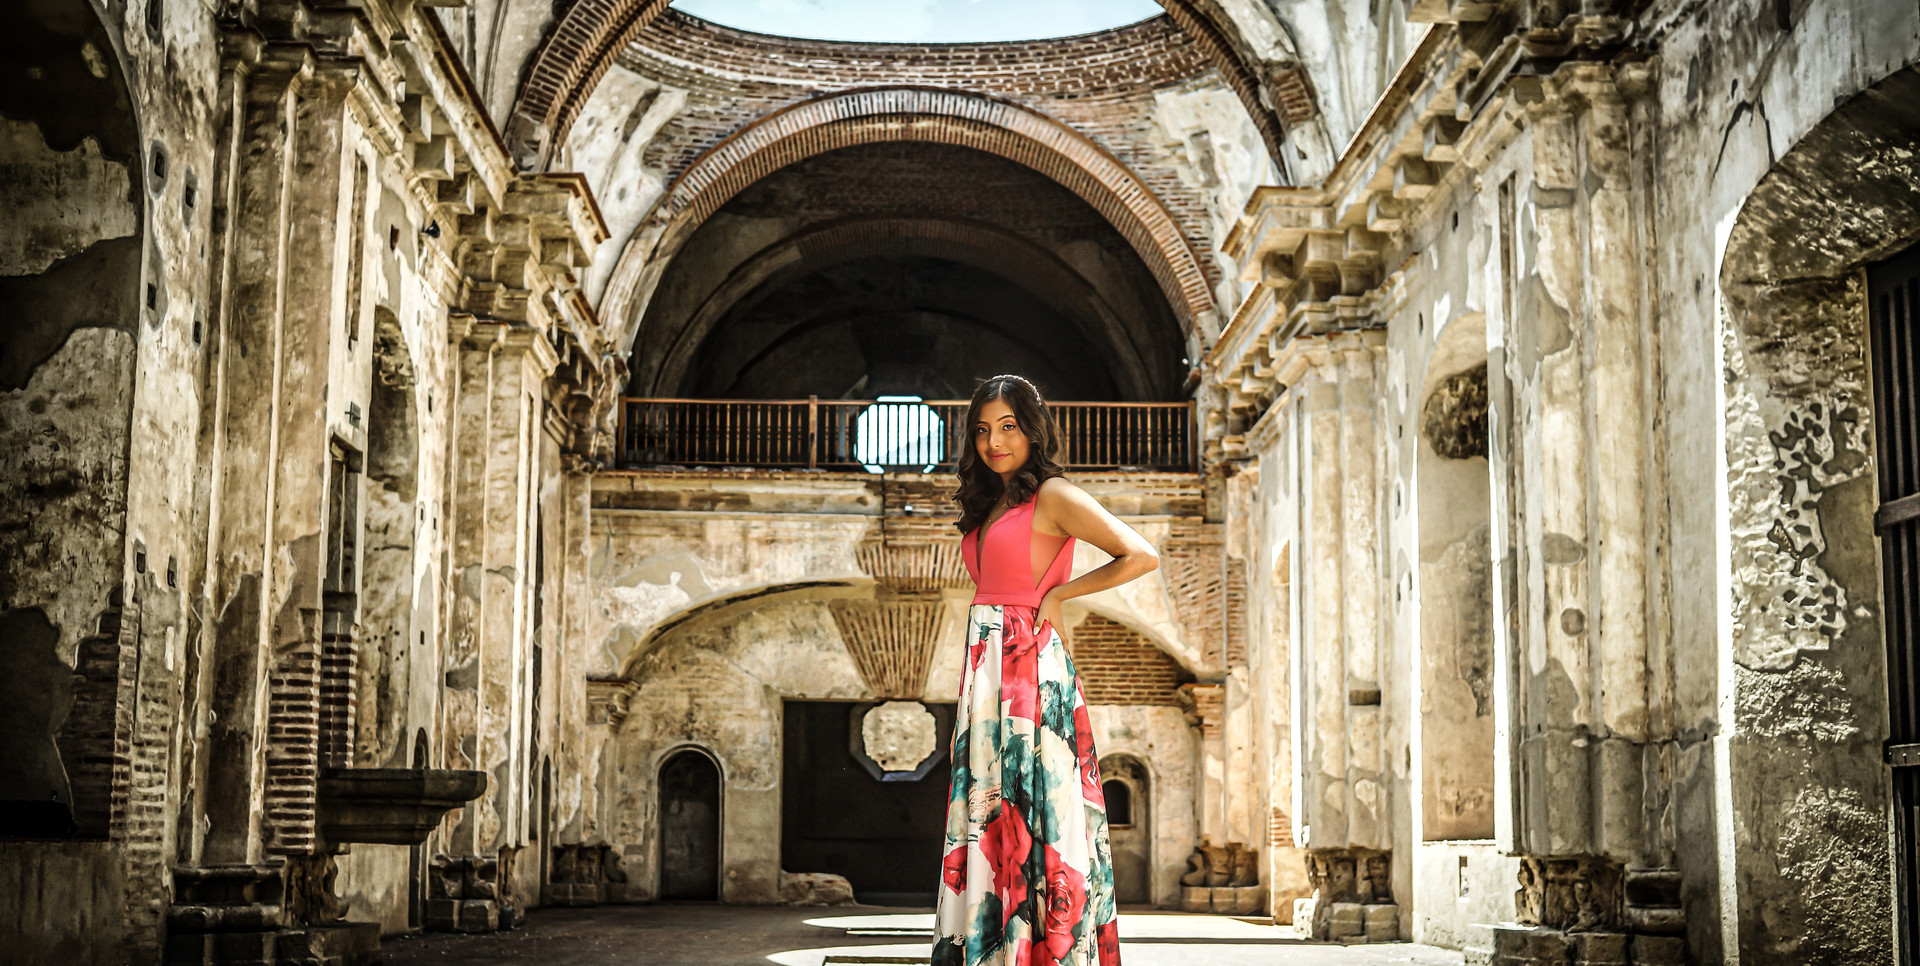 fotografo brayan arreola www.caestudiosg